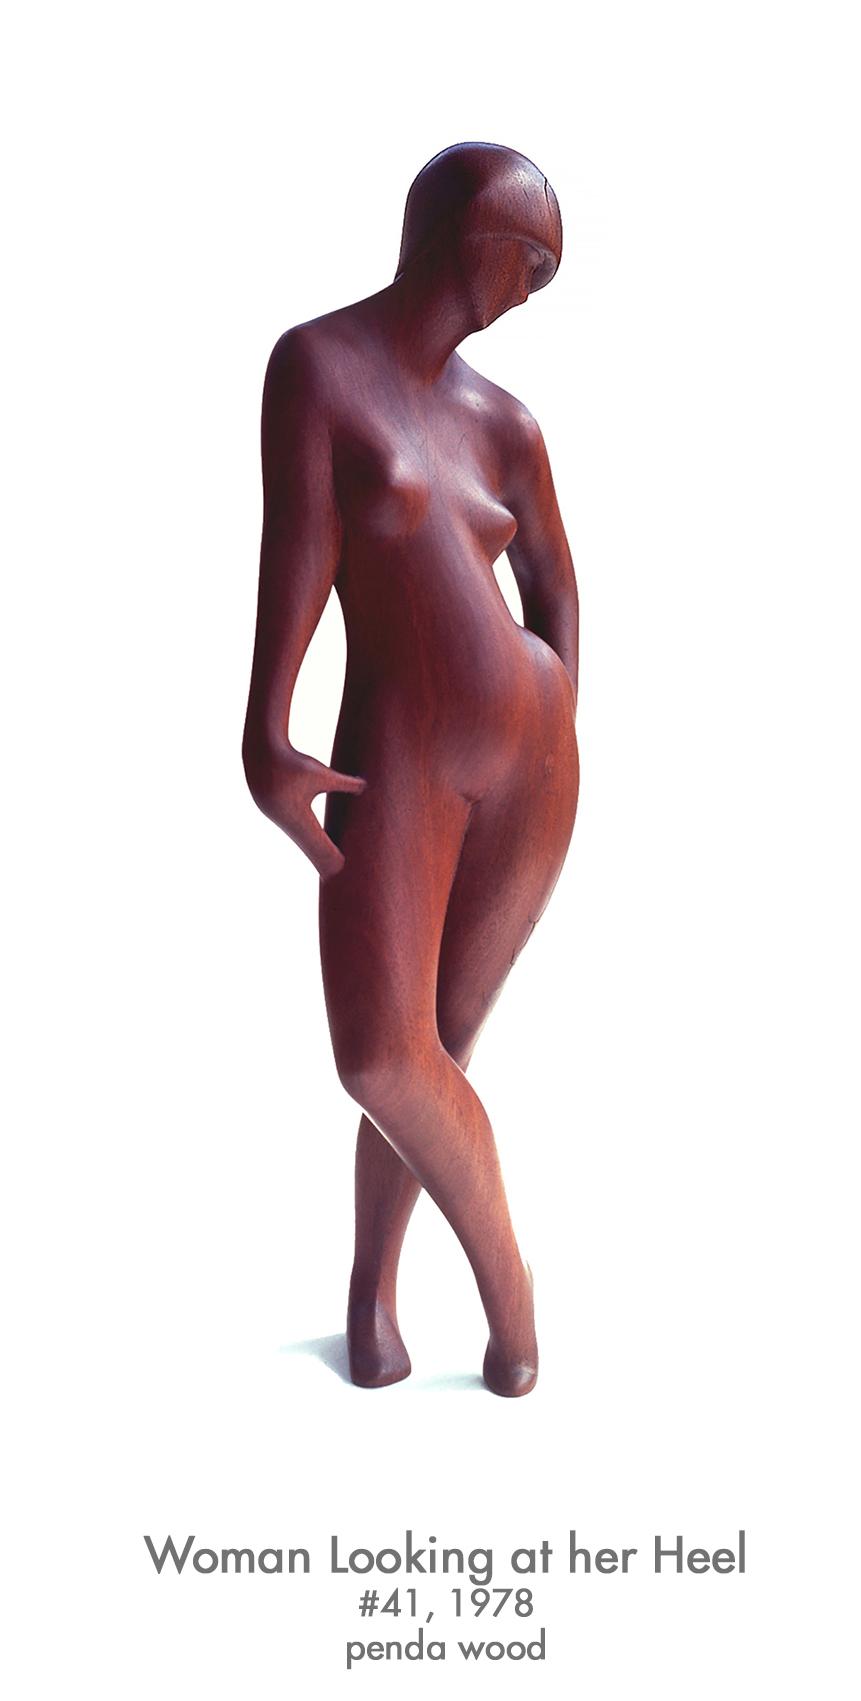 Woman Looking at her Heel